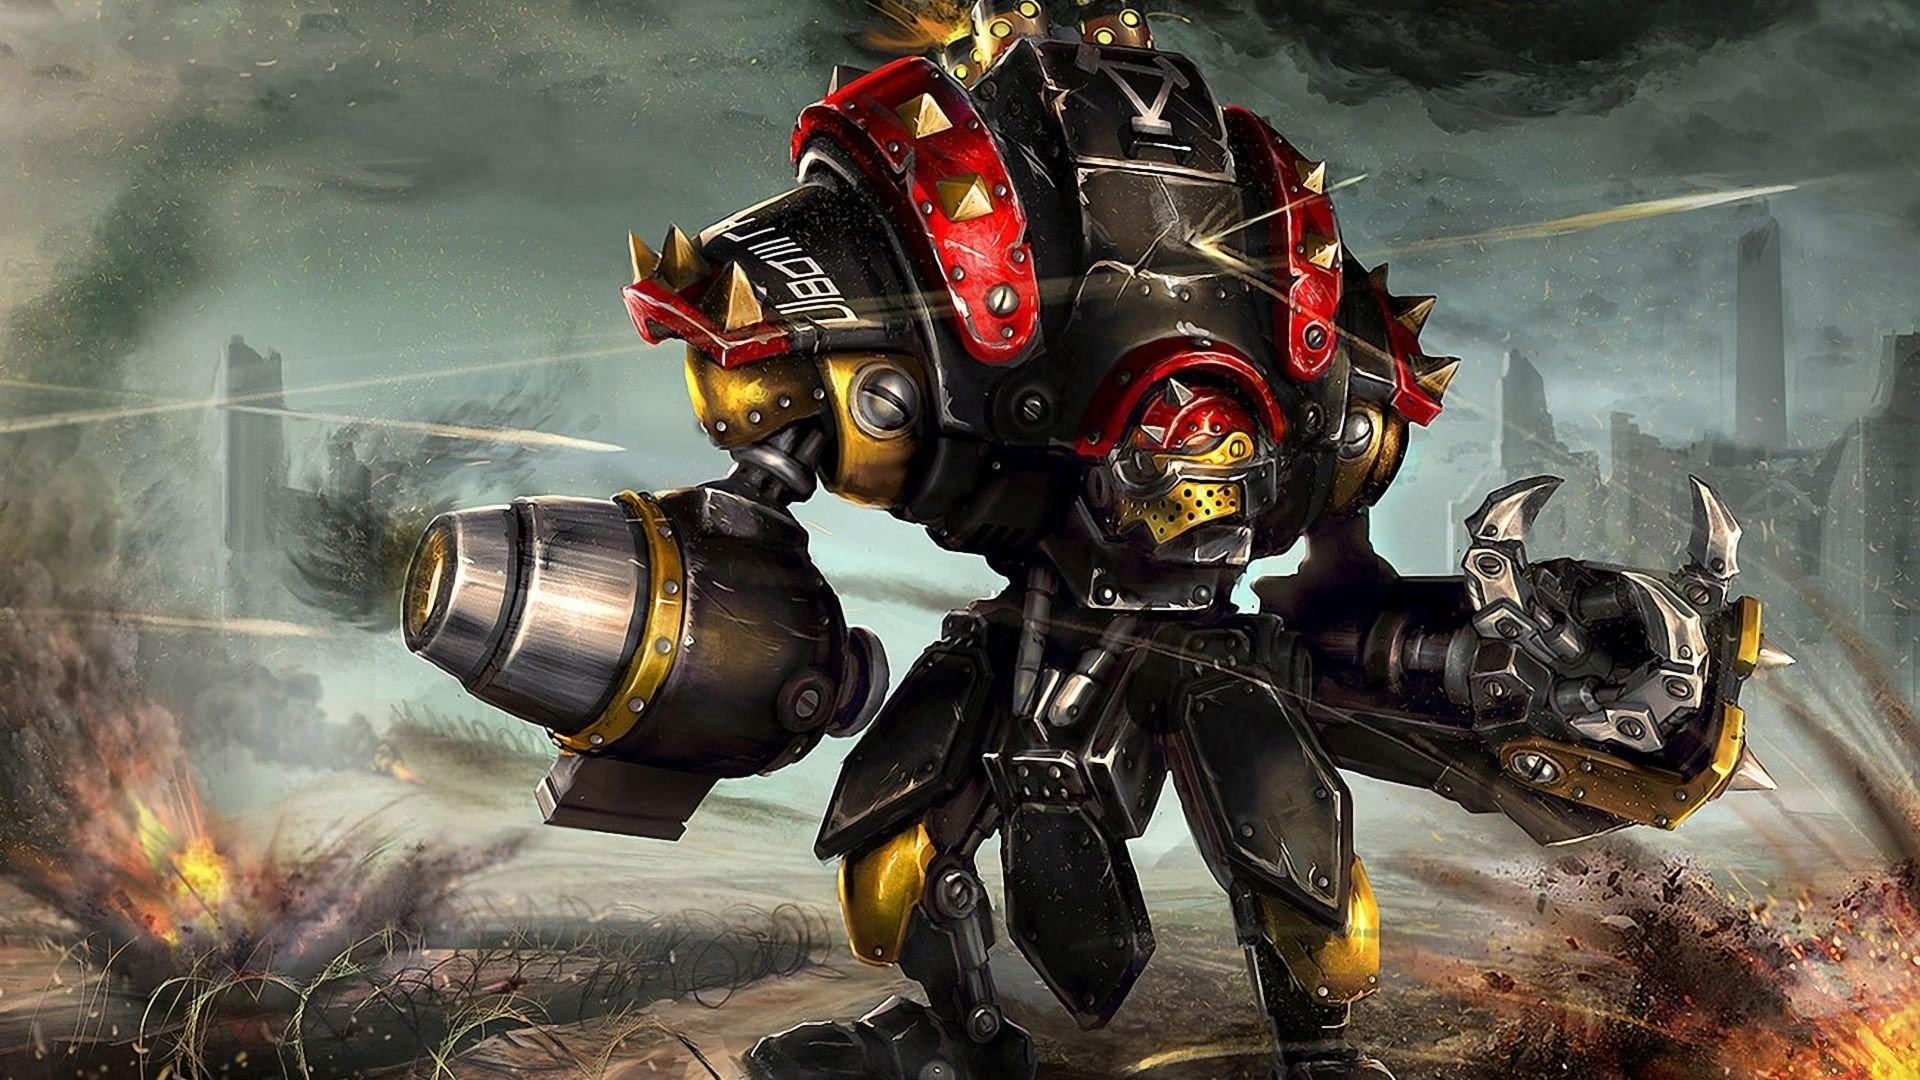 Robots Mechs Artwork Fantasy Art War Destruction Concept Warmachine